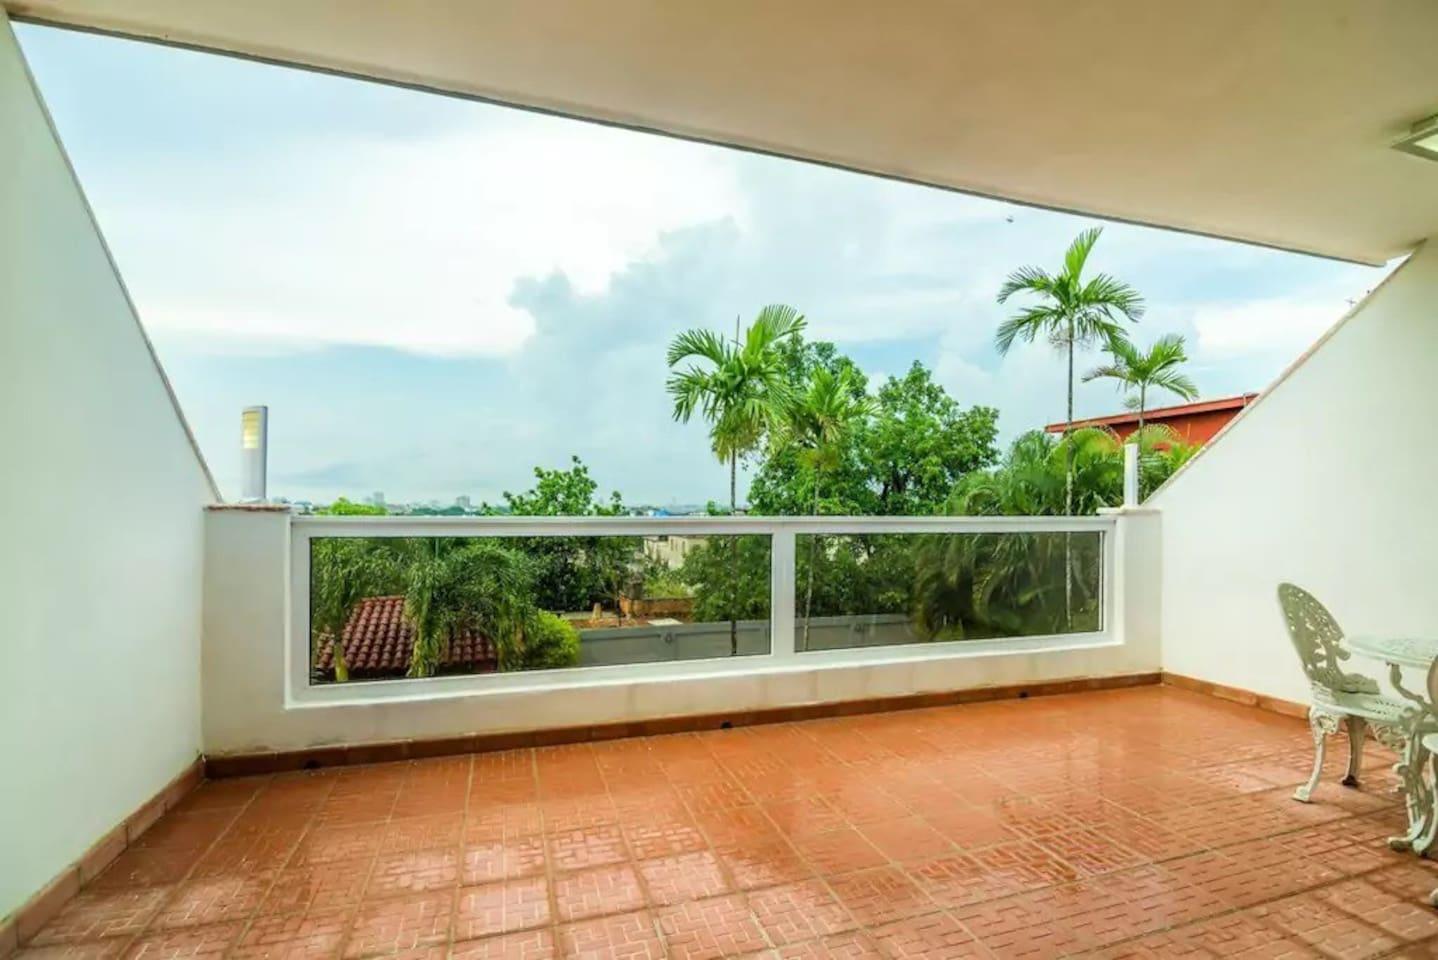 Apartment Villa Don Teto Suite   8 Rooms  Great Havana View photo 16706799